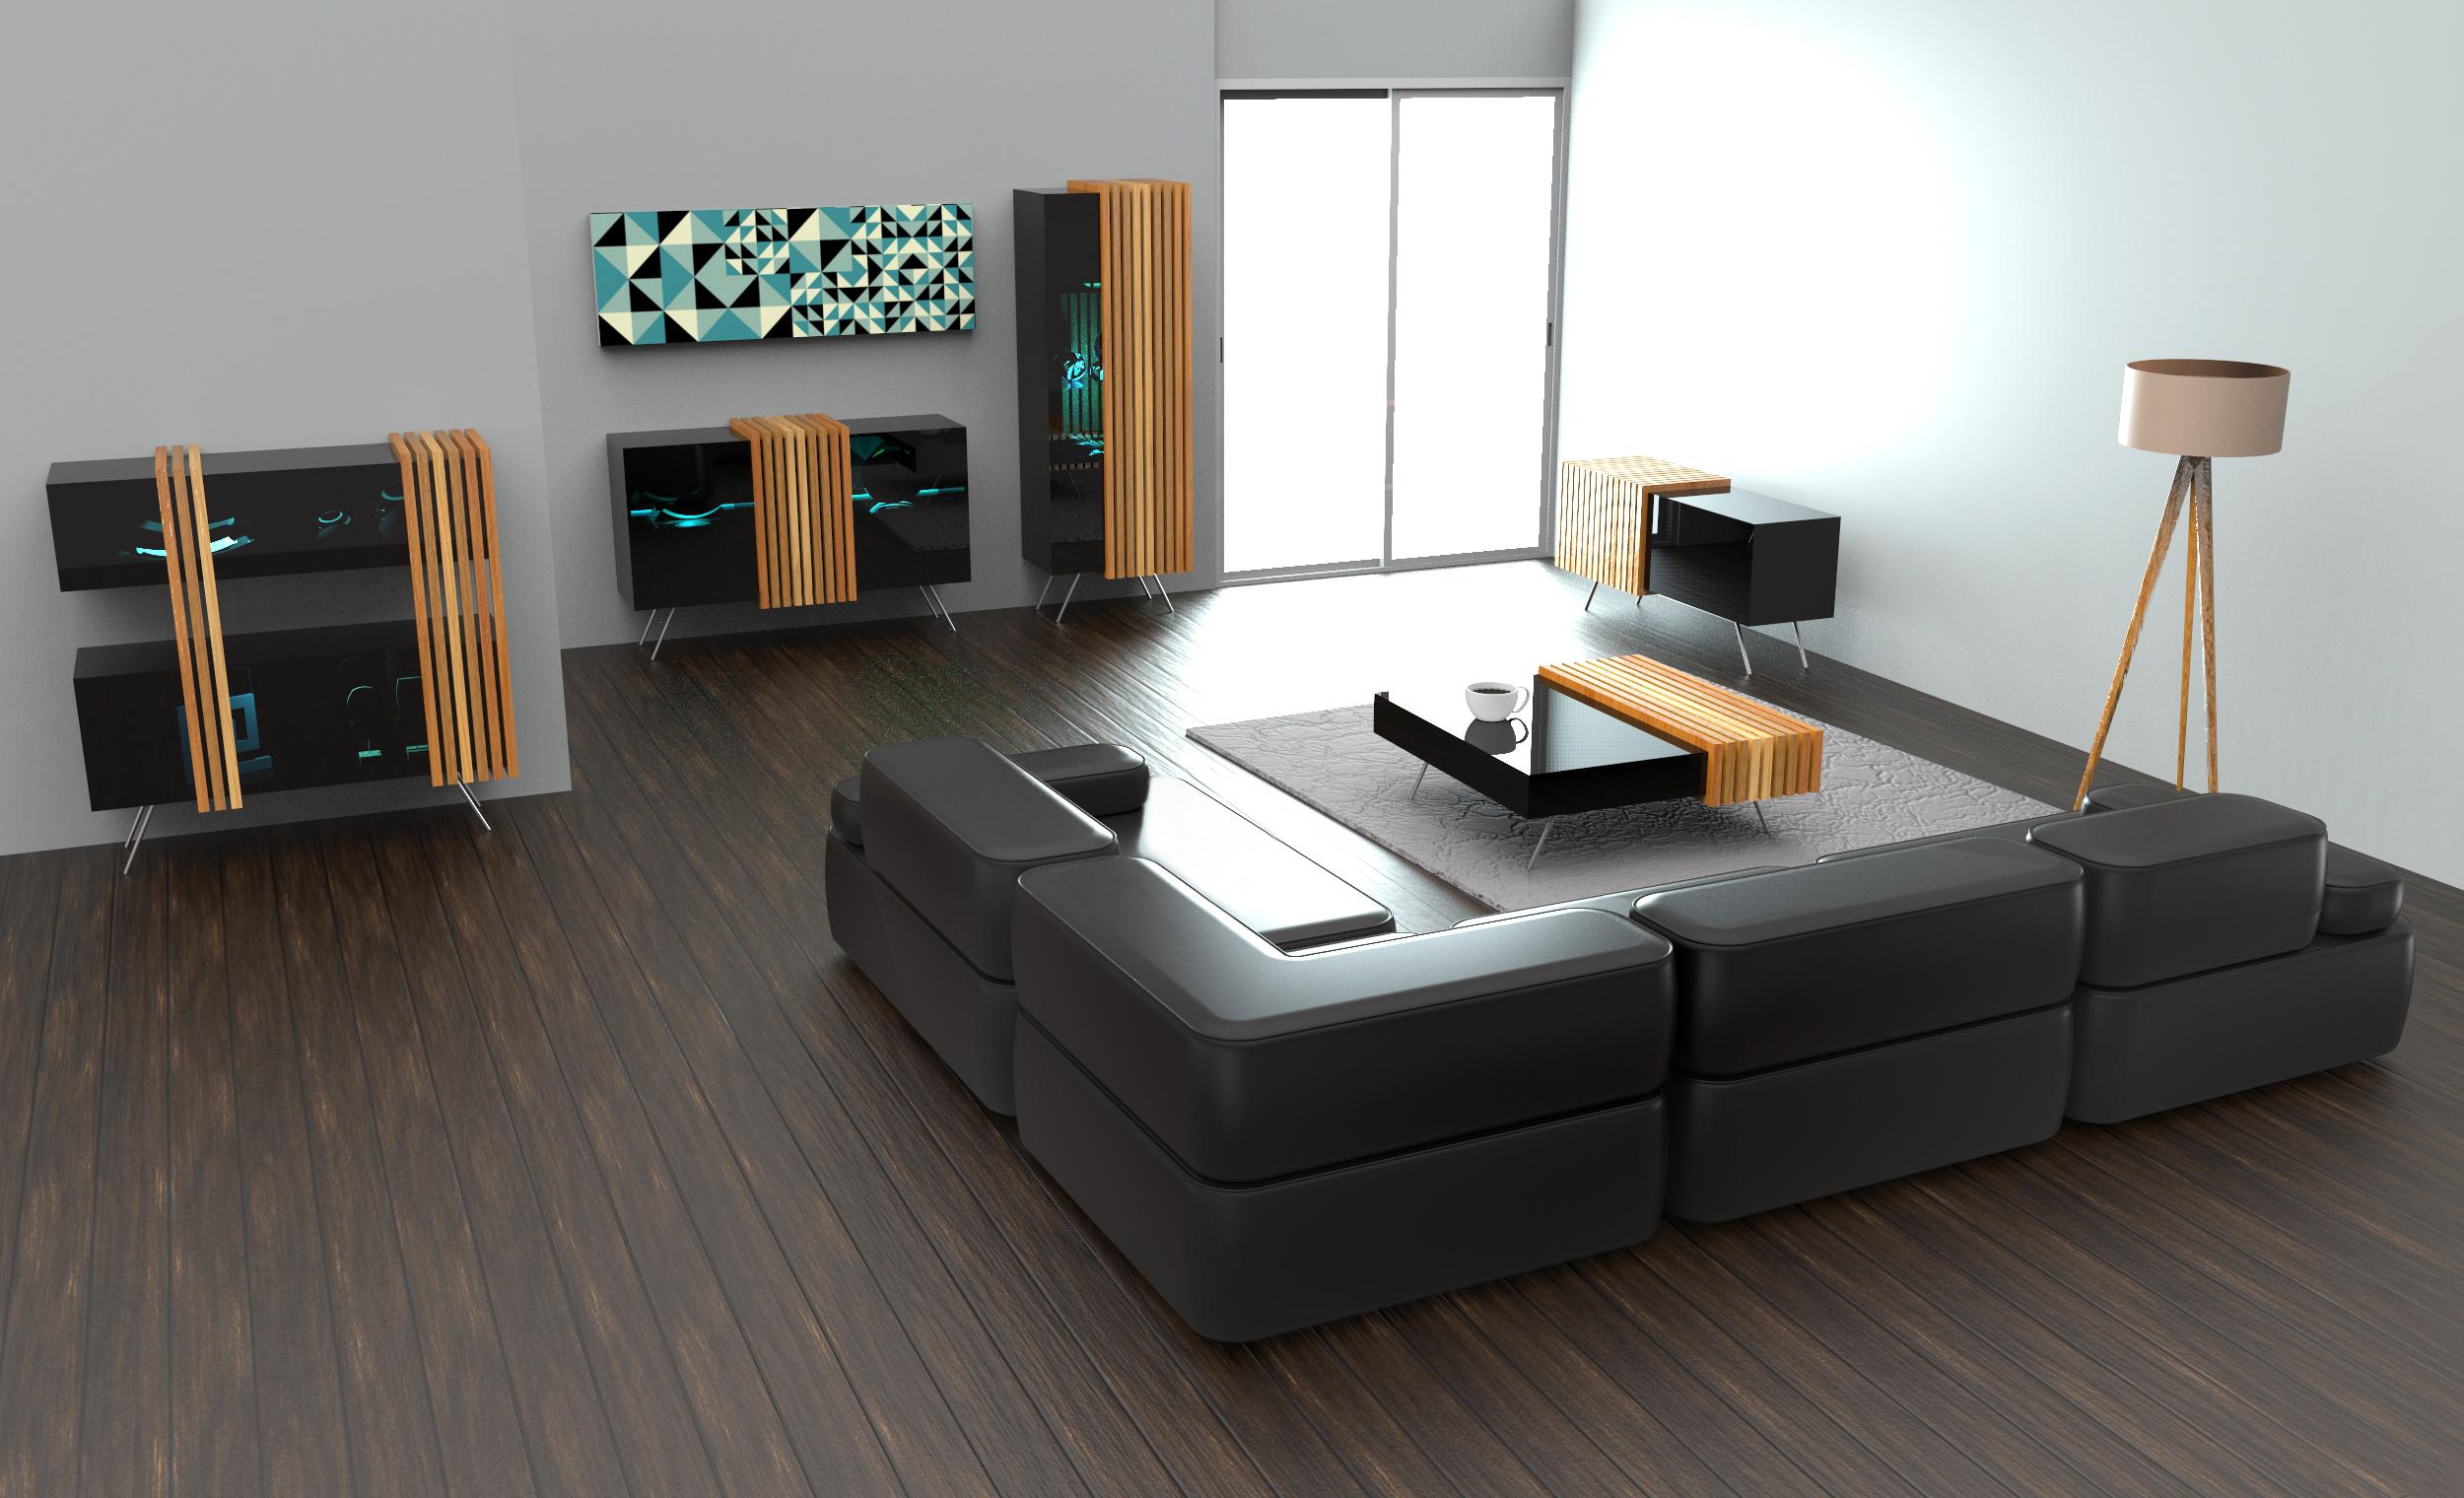 drab-furniture-set-arrangement-pawlowska-design